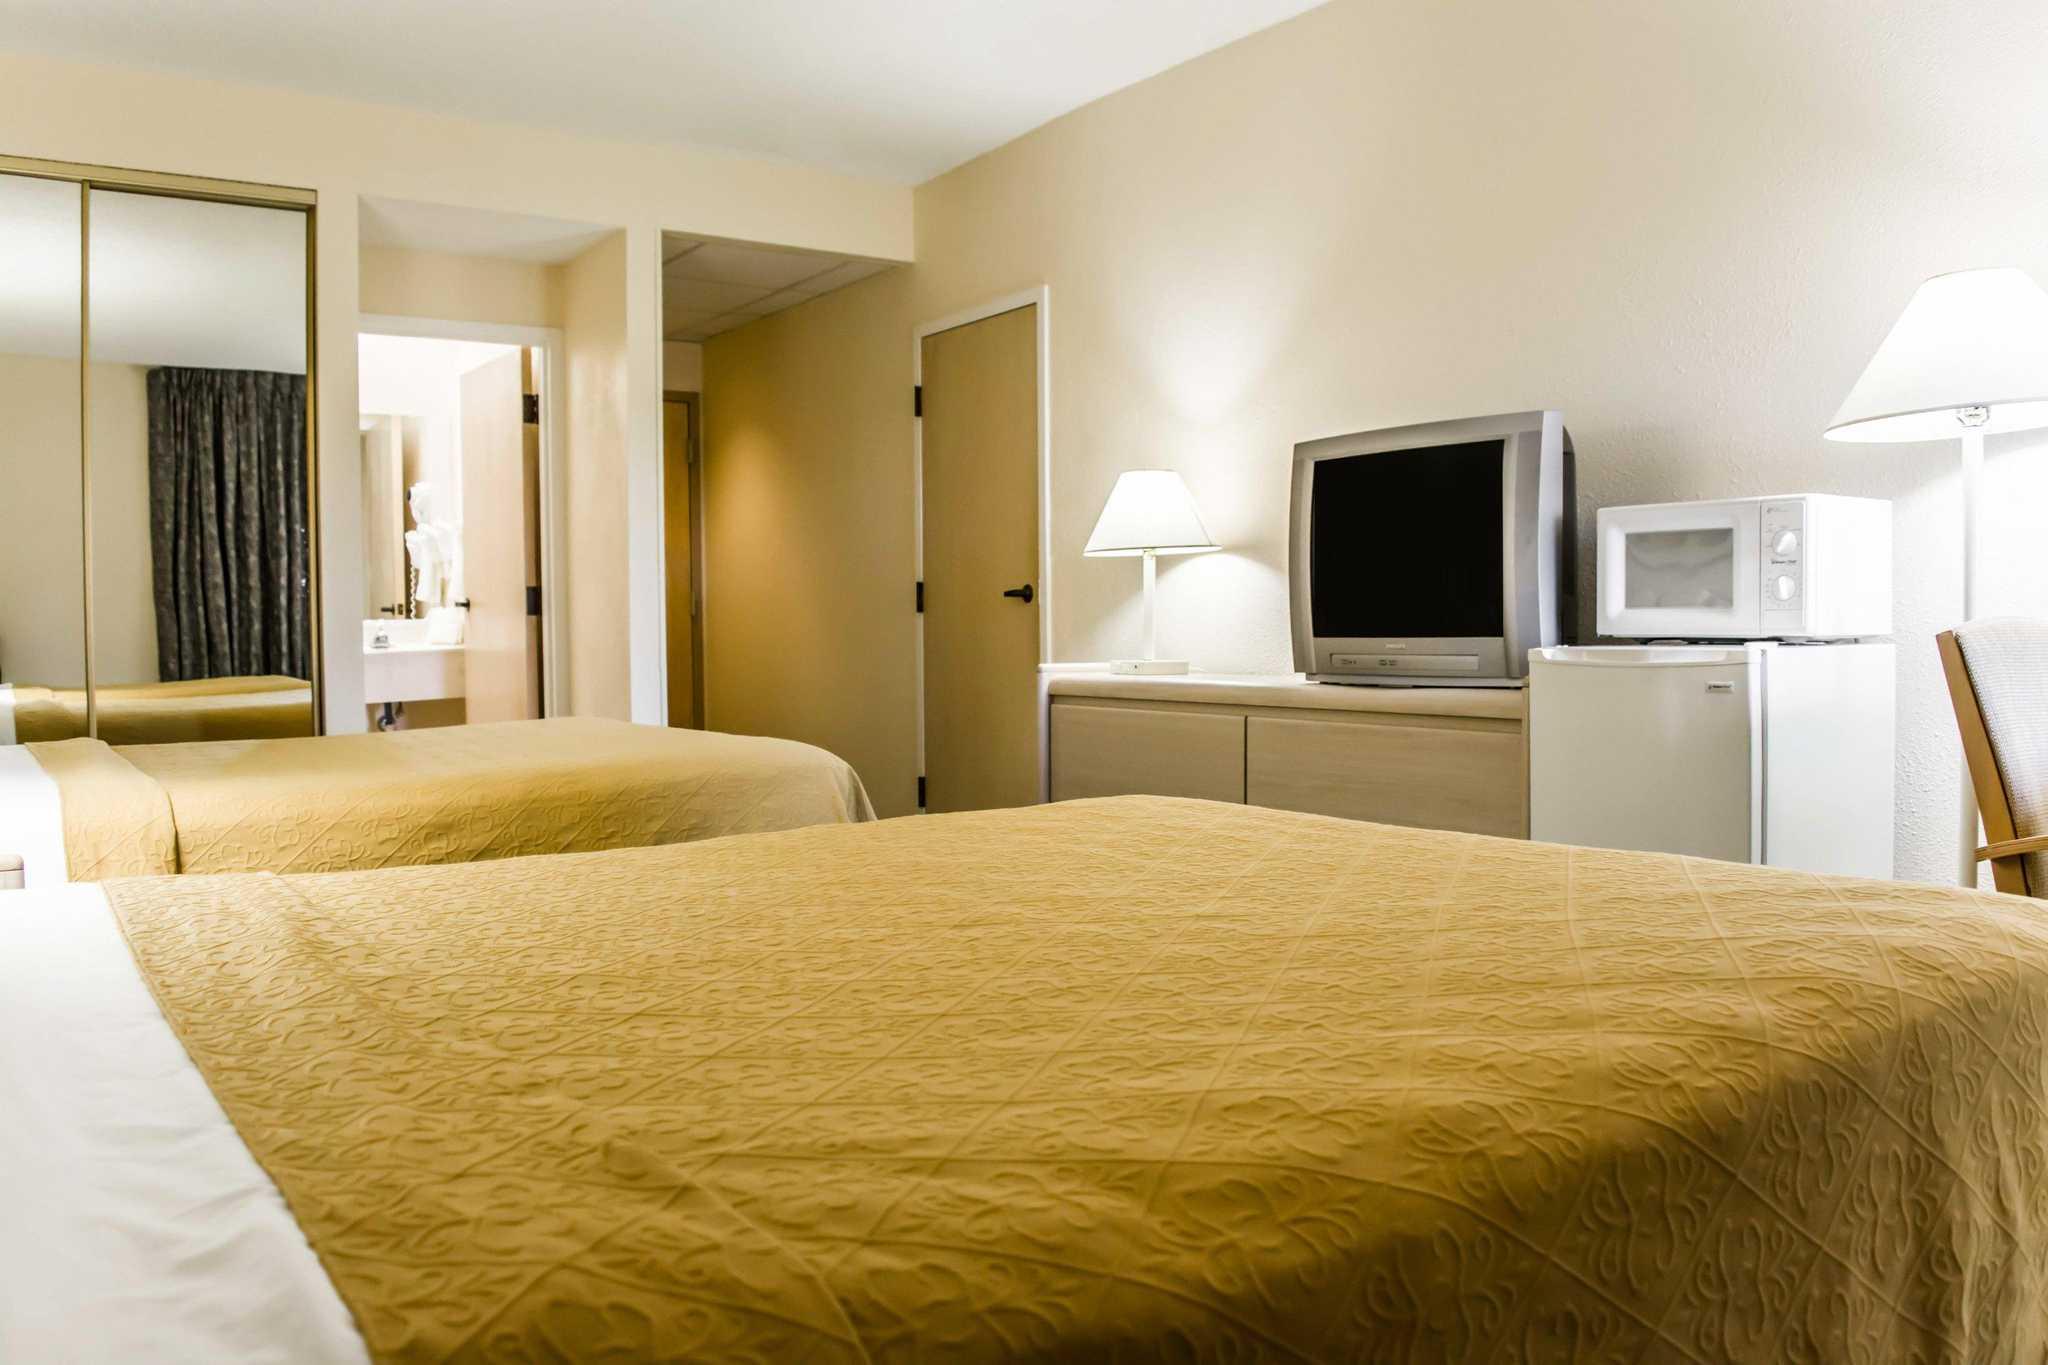 Quality Inn & Suites Golf Resort image 6